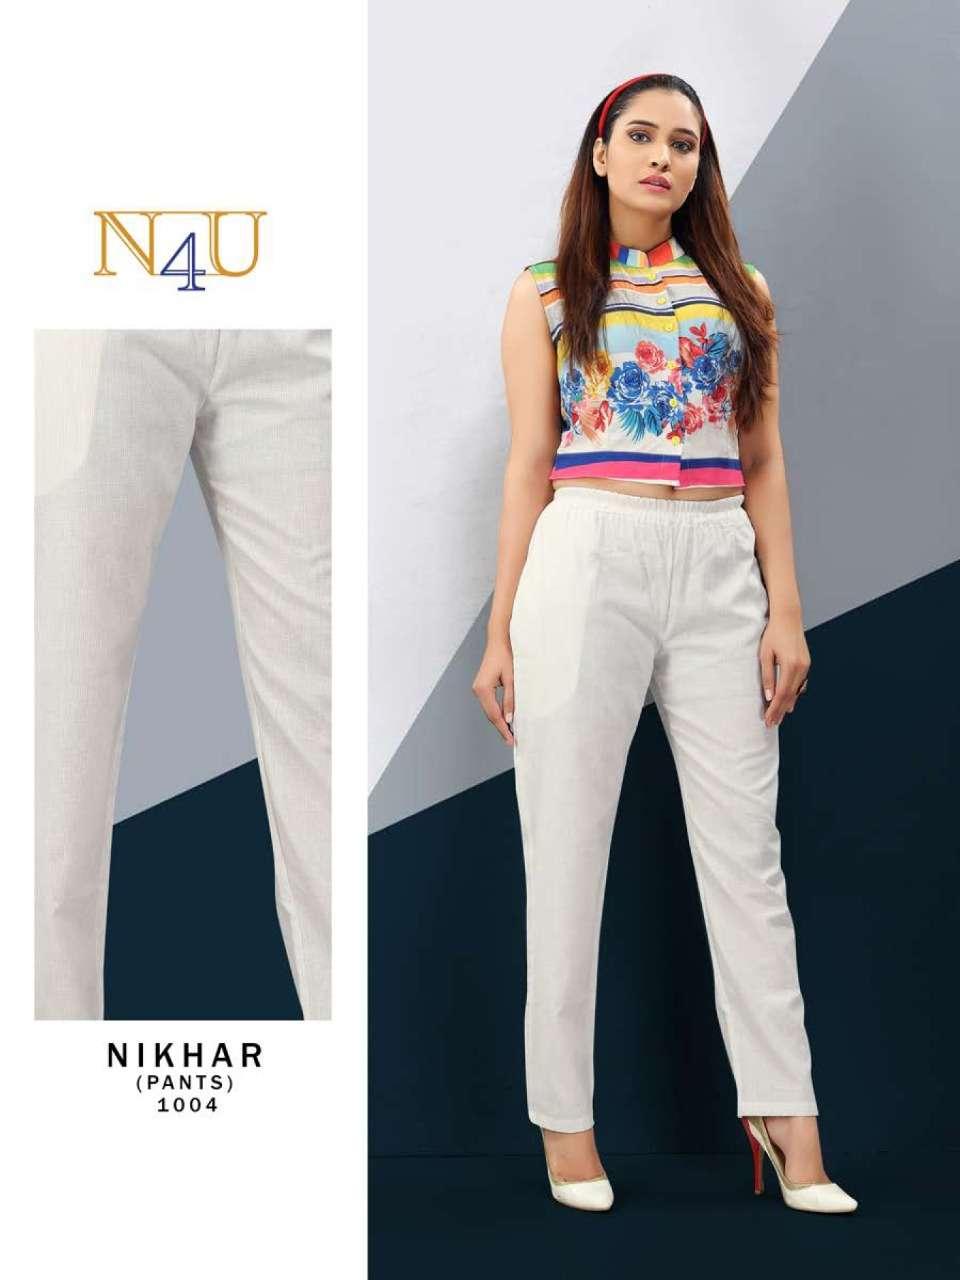 N4U Nikhar NX By tunic House Cotton pant New catalog Buy Online